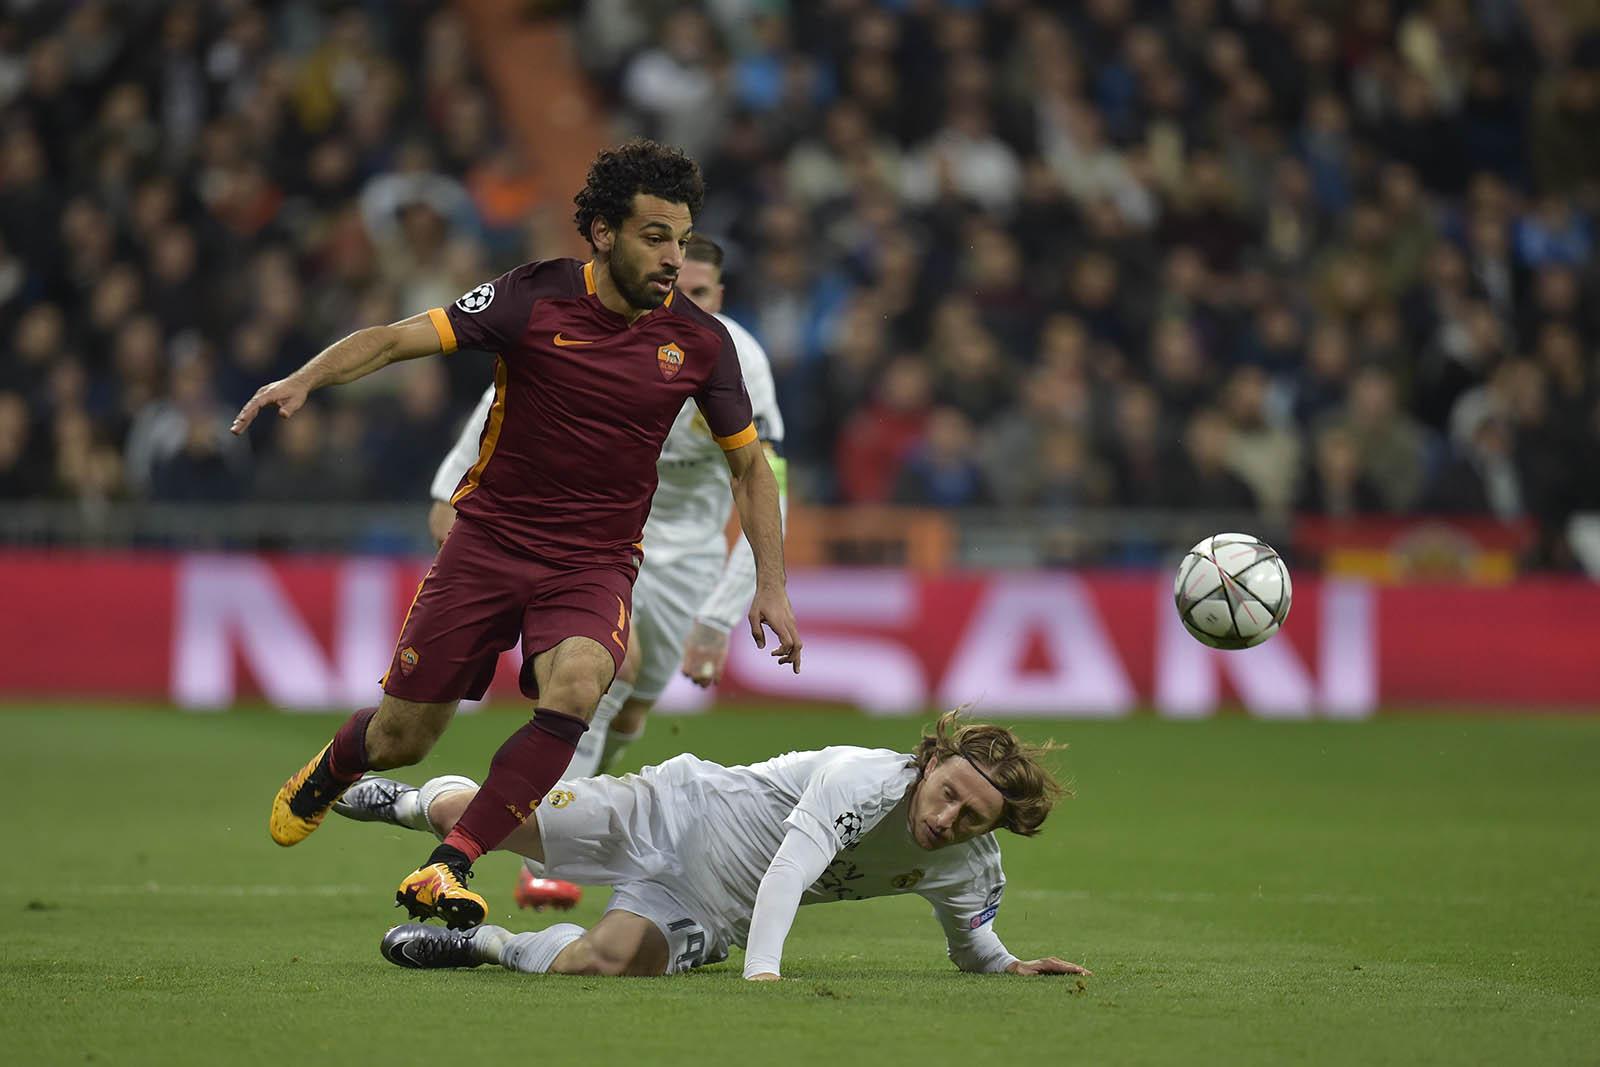 Credits: AS Roma